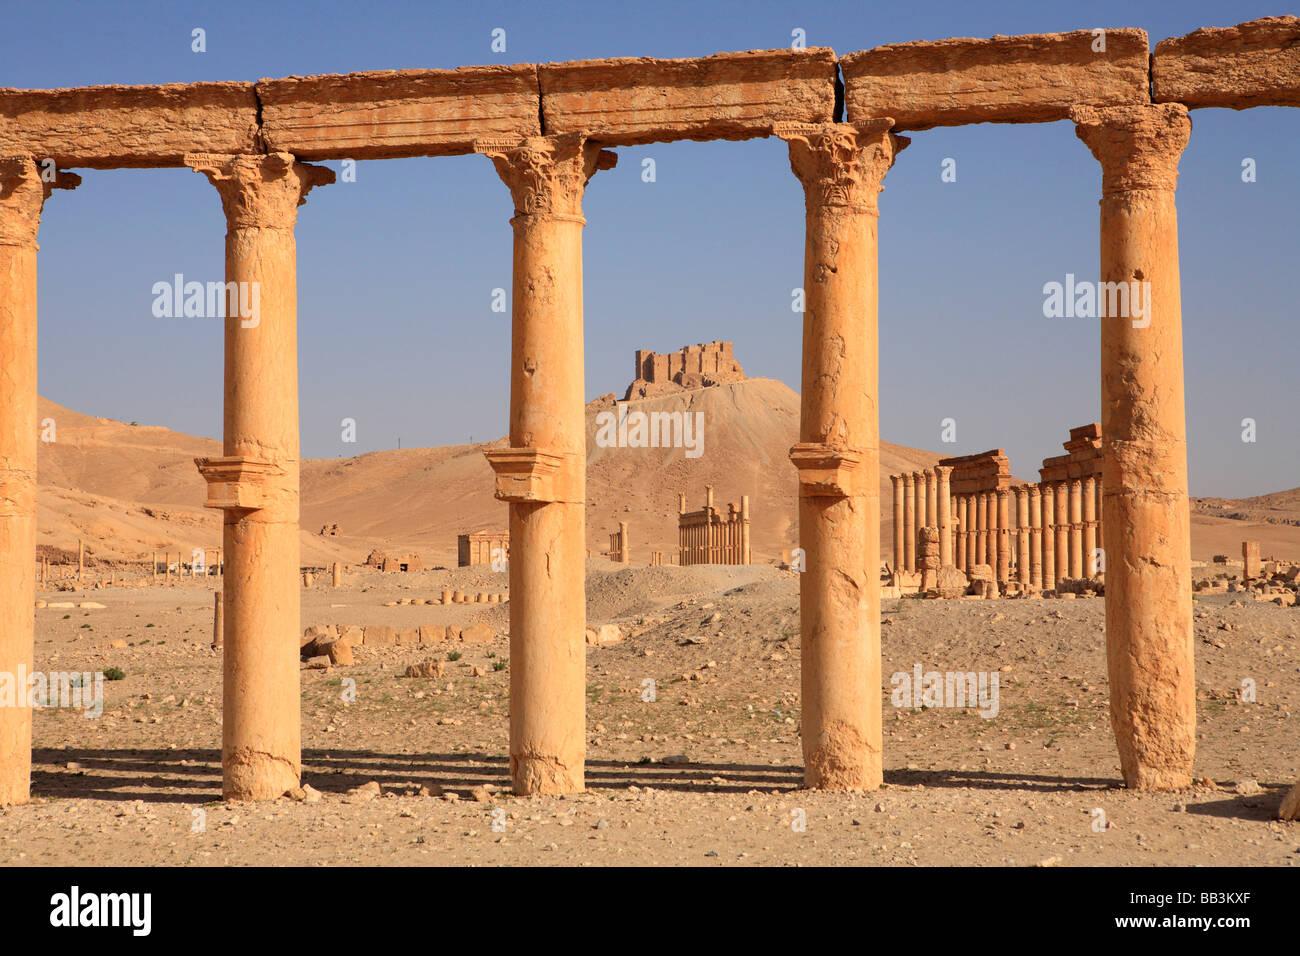 Ancient ruins, Palmyra, Syria - Stock Image